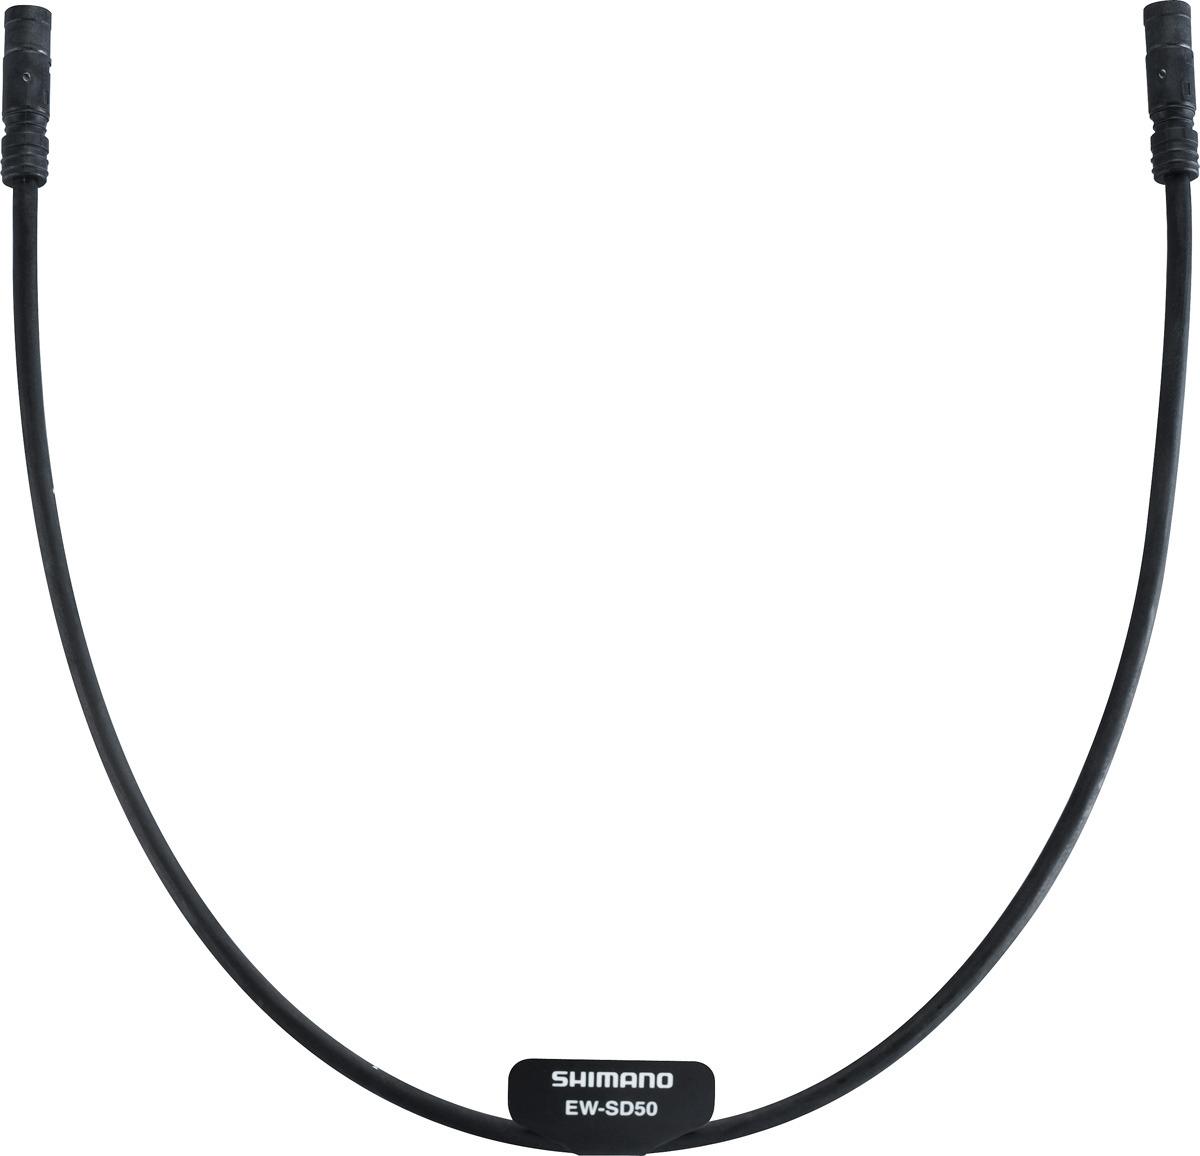 Электропровод Shimano Di2 EW-SD50, для Ultegra Di2, STEPS, 350 мм, IEWSD50L35, черный велосипед cervelo p3 ultegra di2 2018